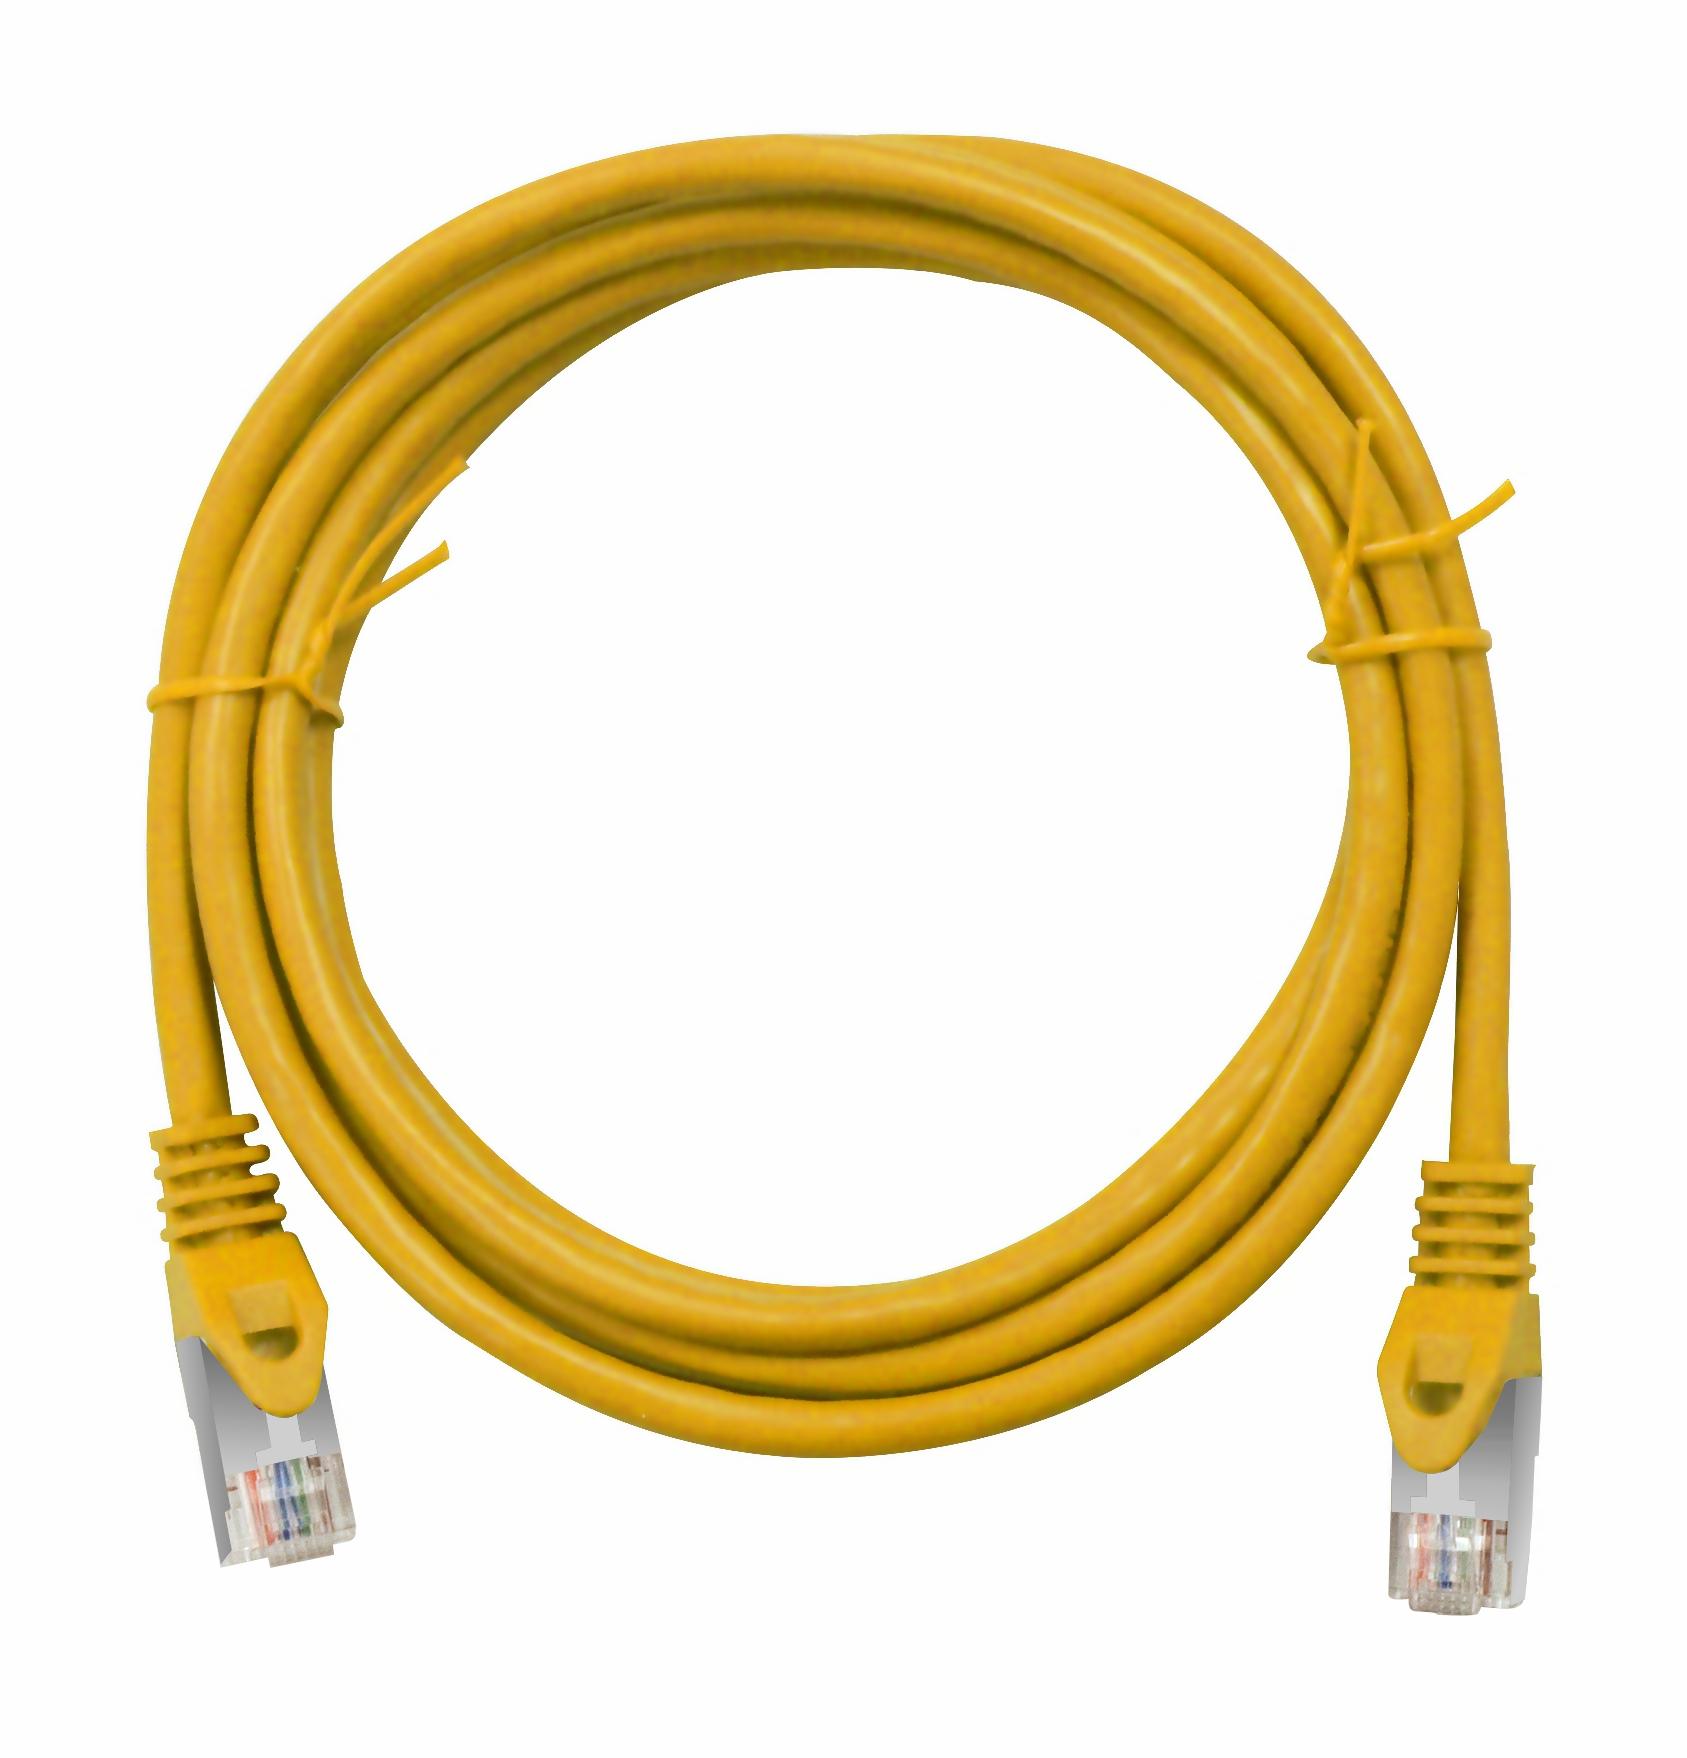 1 Stk Patchkabel RJ45 geschirmt Cat.5e, PVC, gelb, 3,0m H5GLY03K0Y